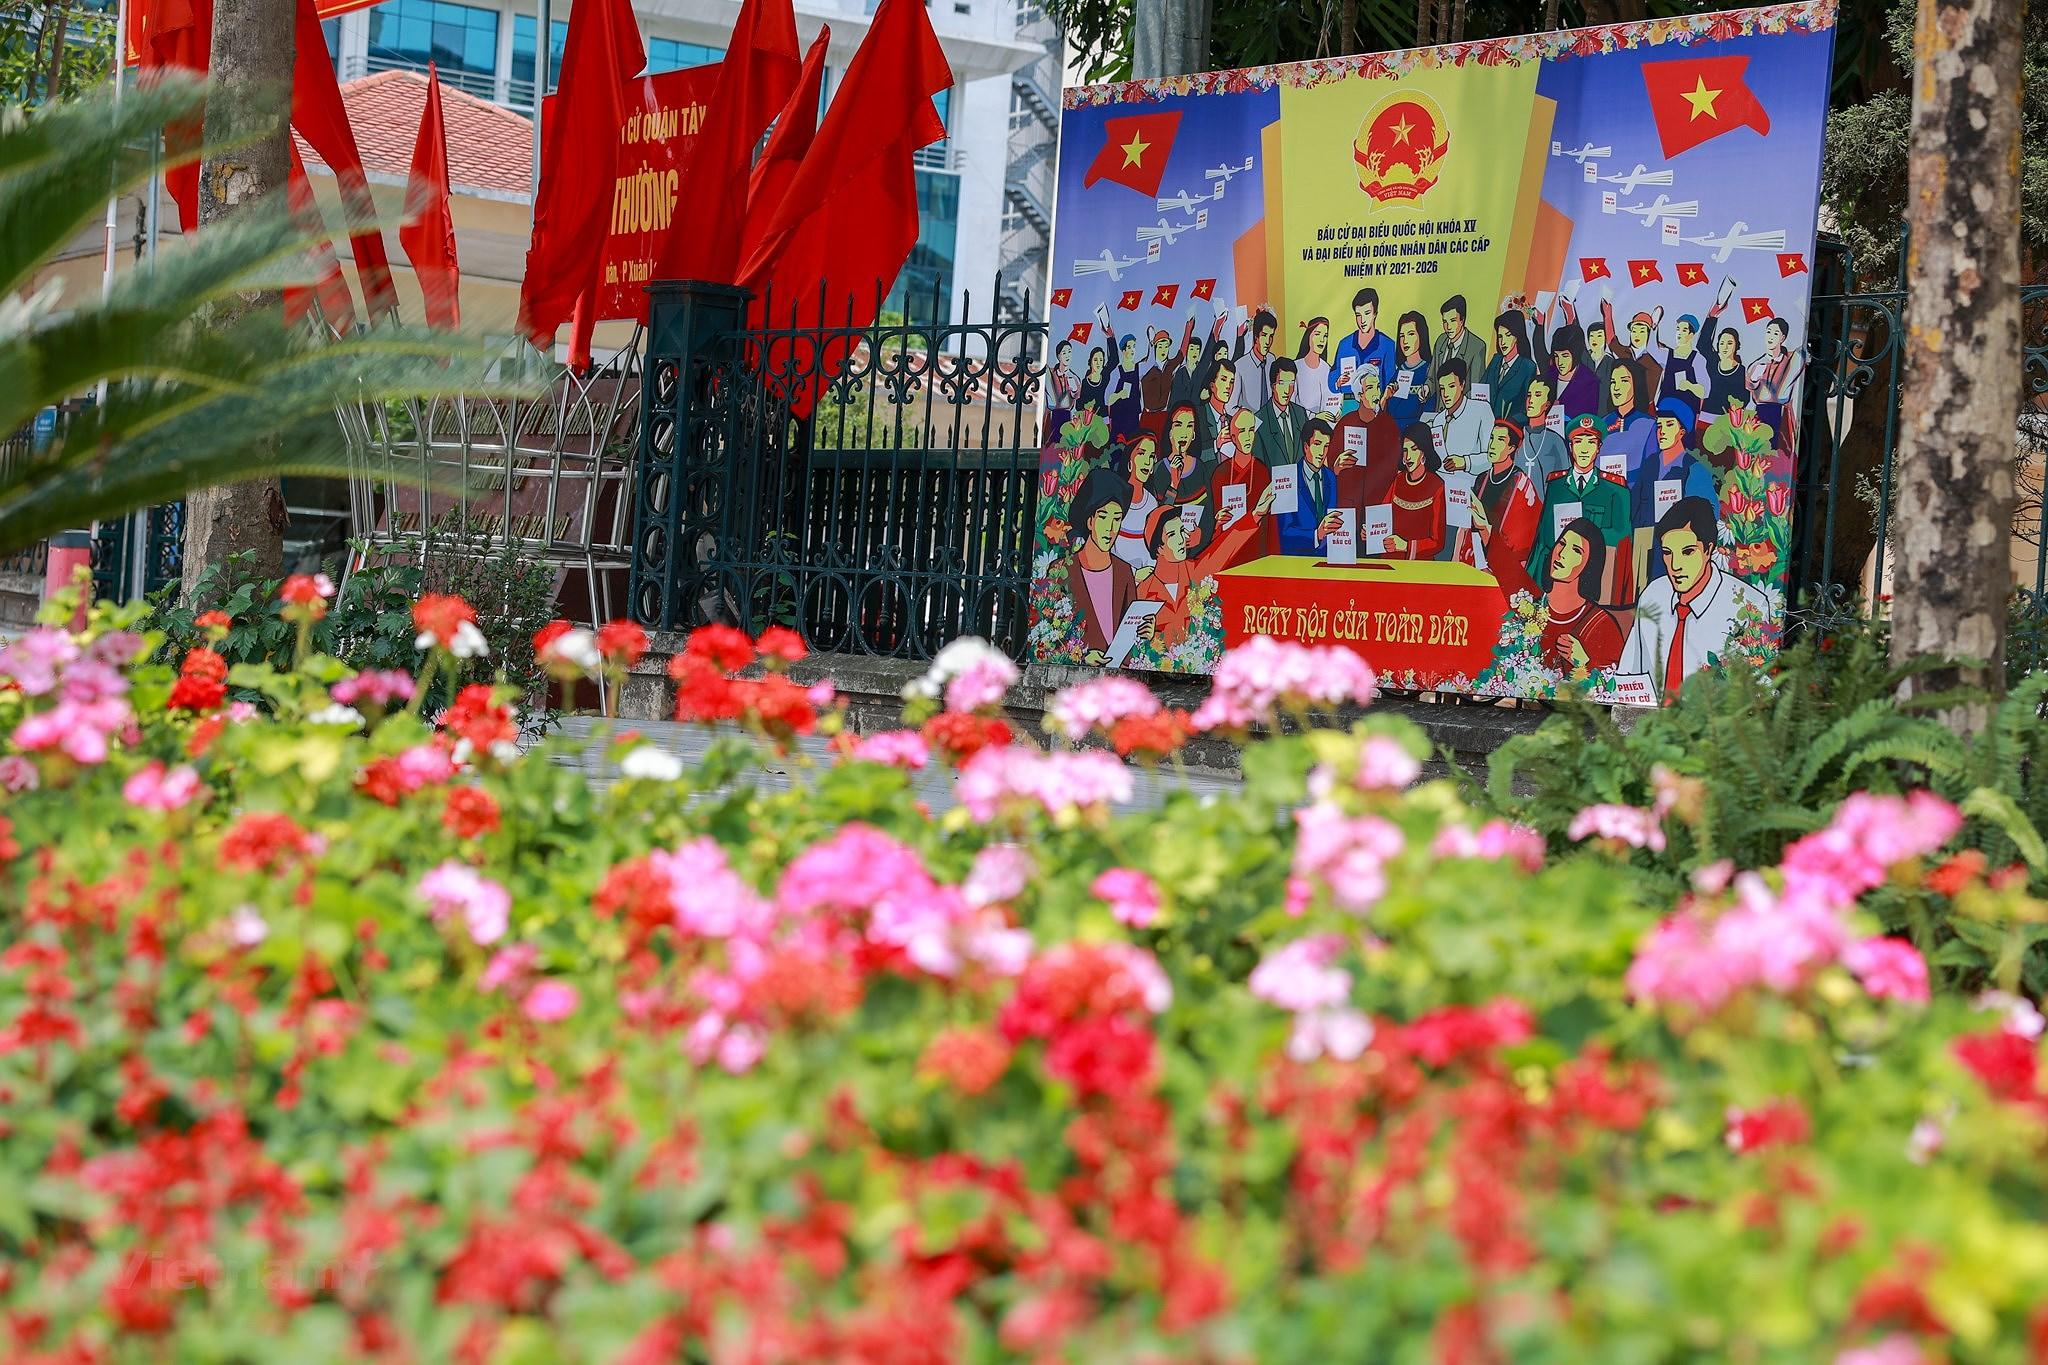 Pho phuong Ha Noi ruc ro co hoa chao don ngay hoi trong dai toan quoc hinh anh 21